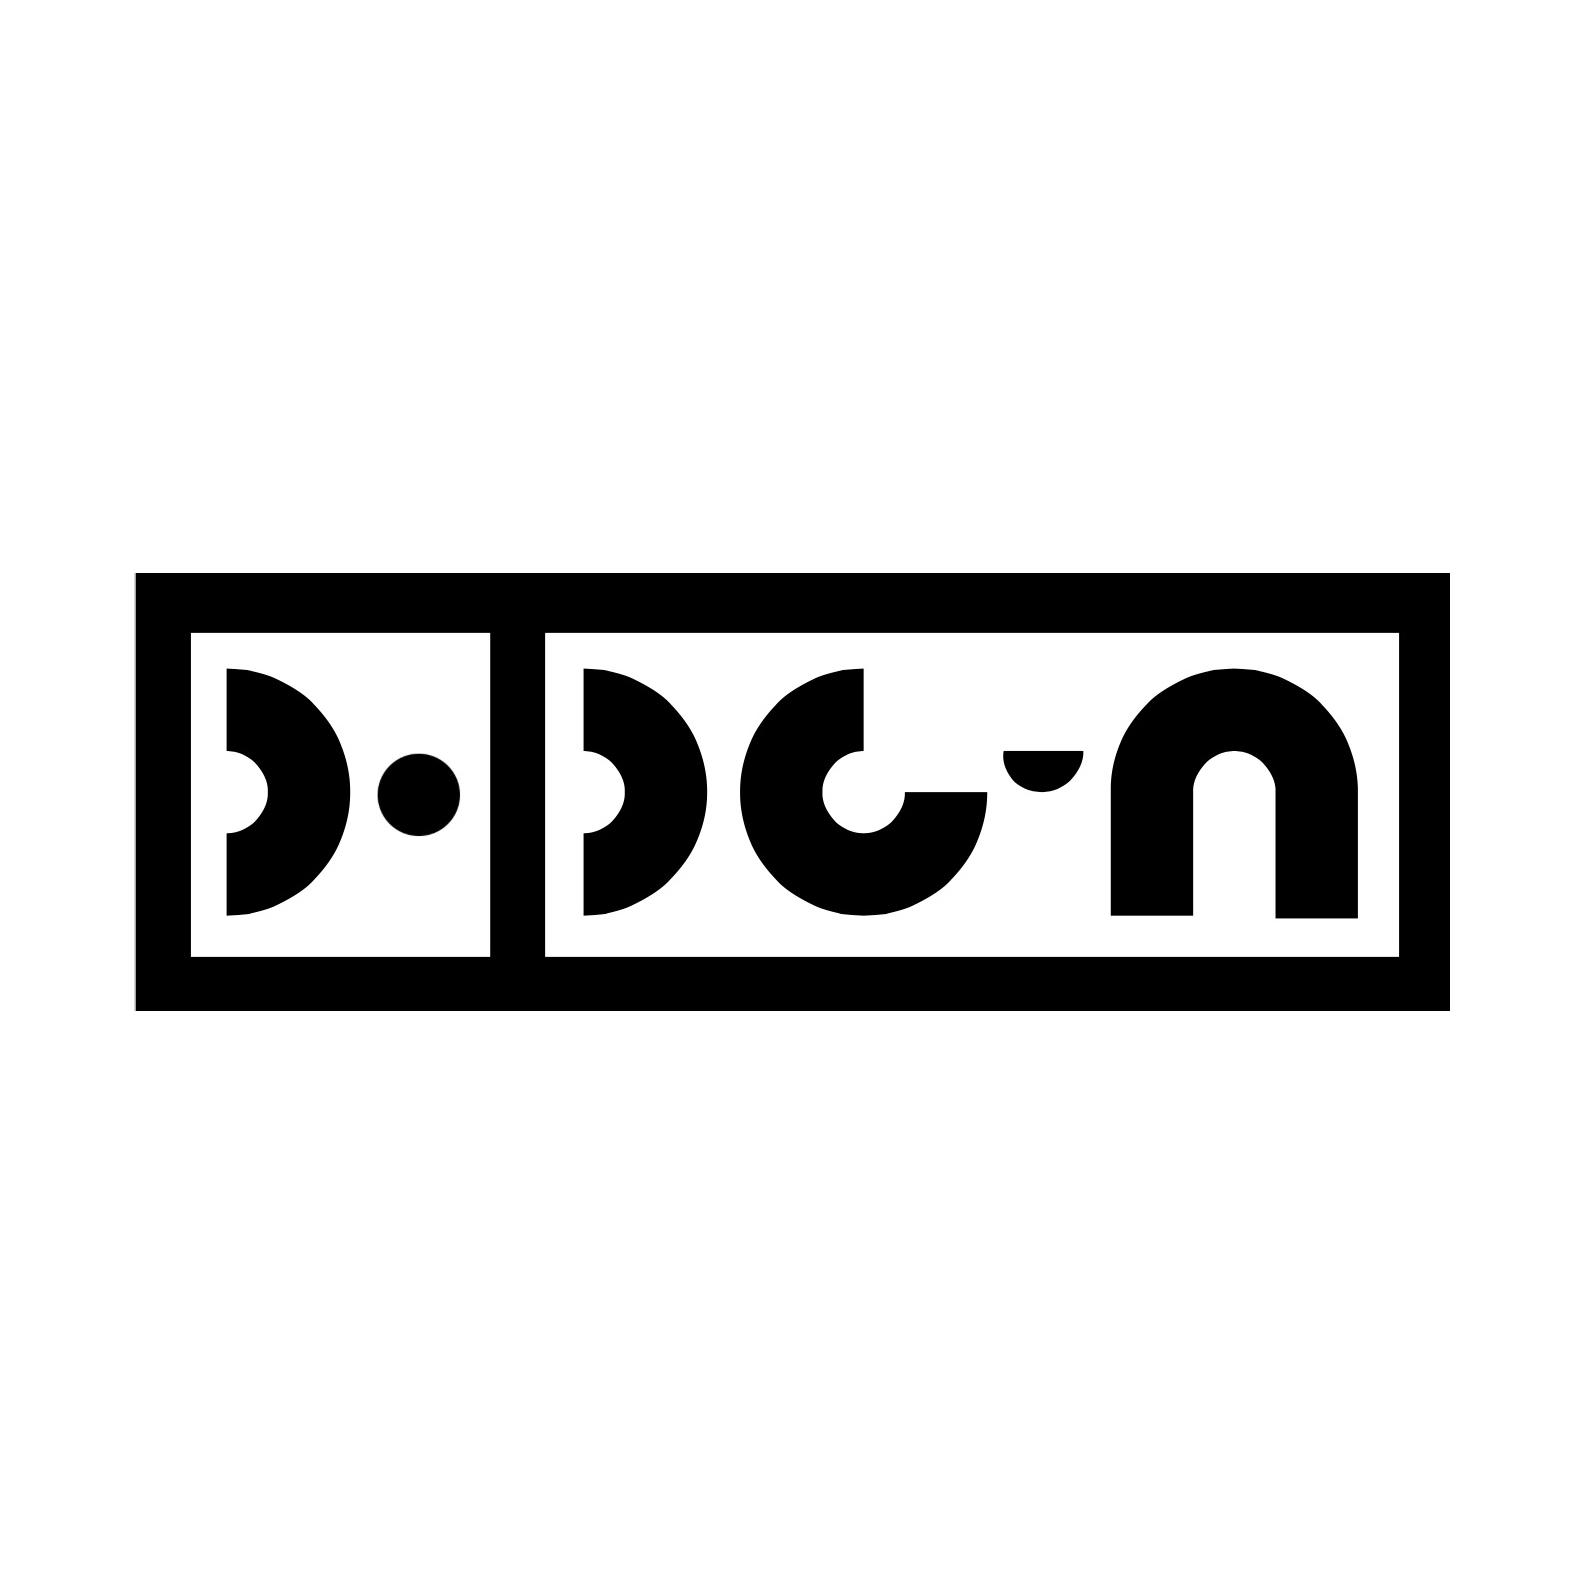 PopGun Presents   Music Curators & Event Production